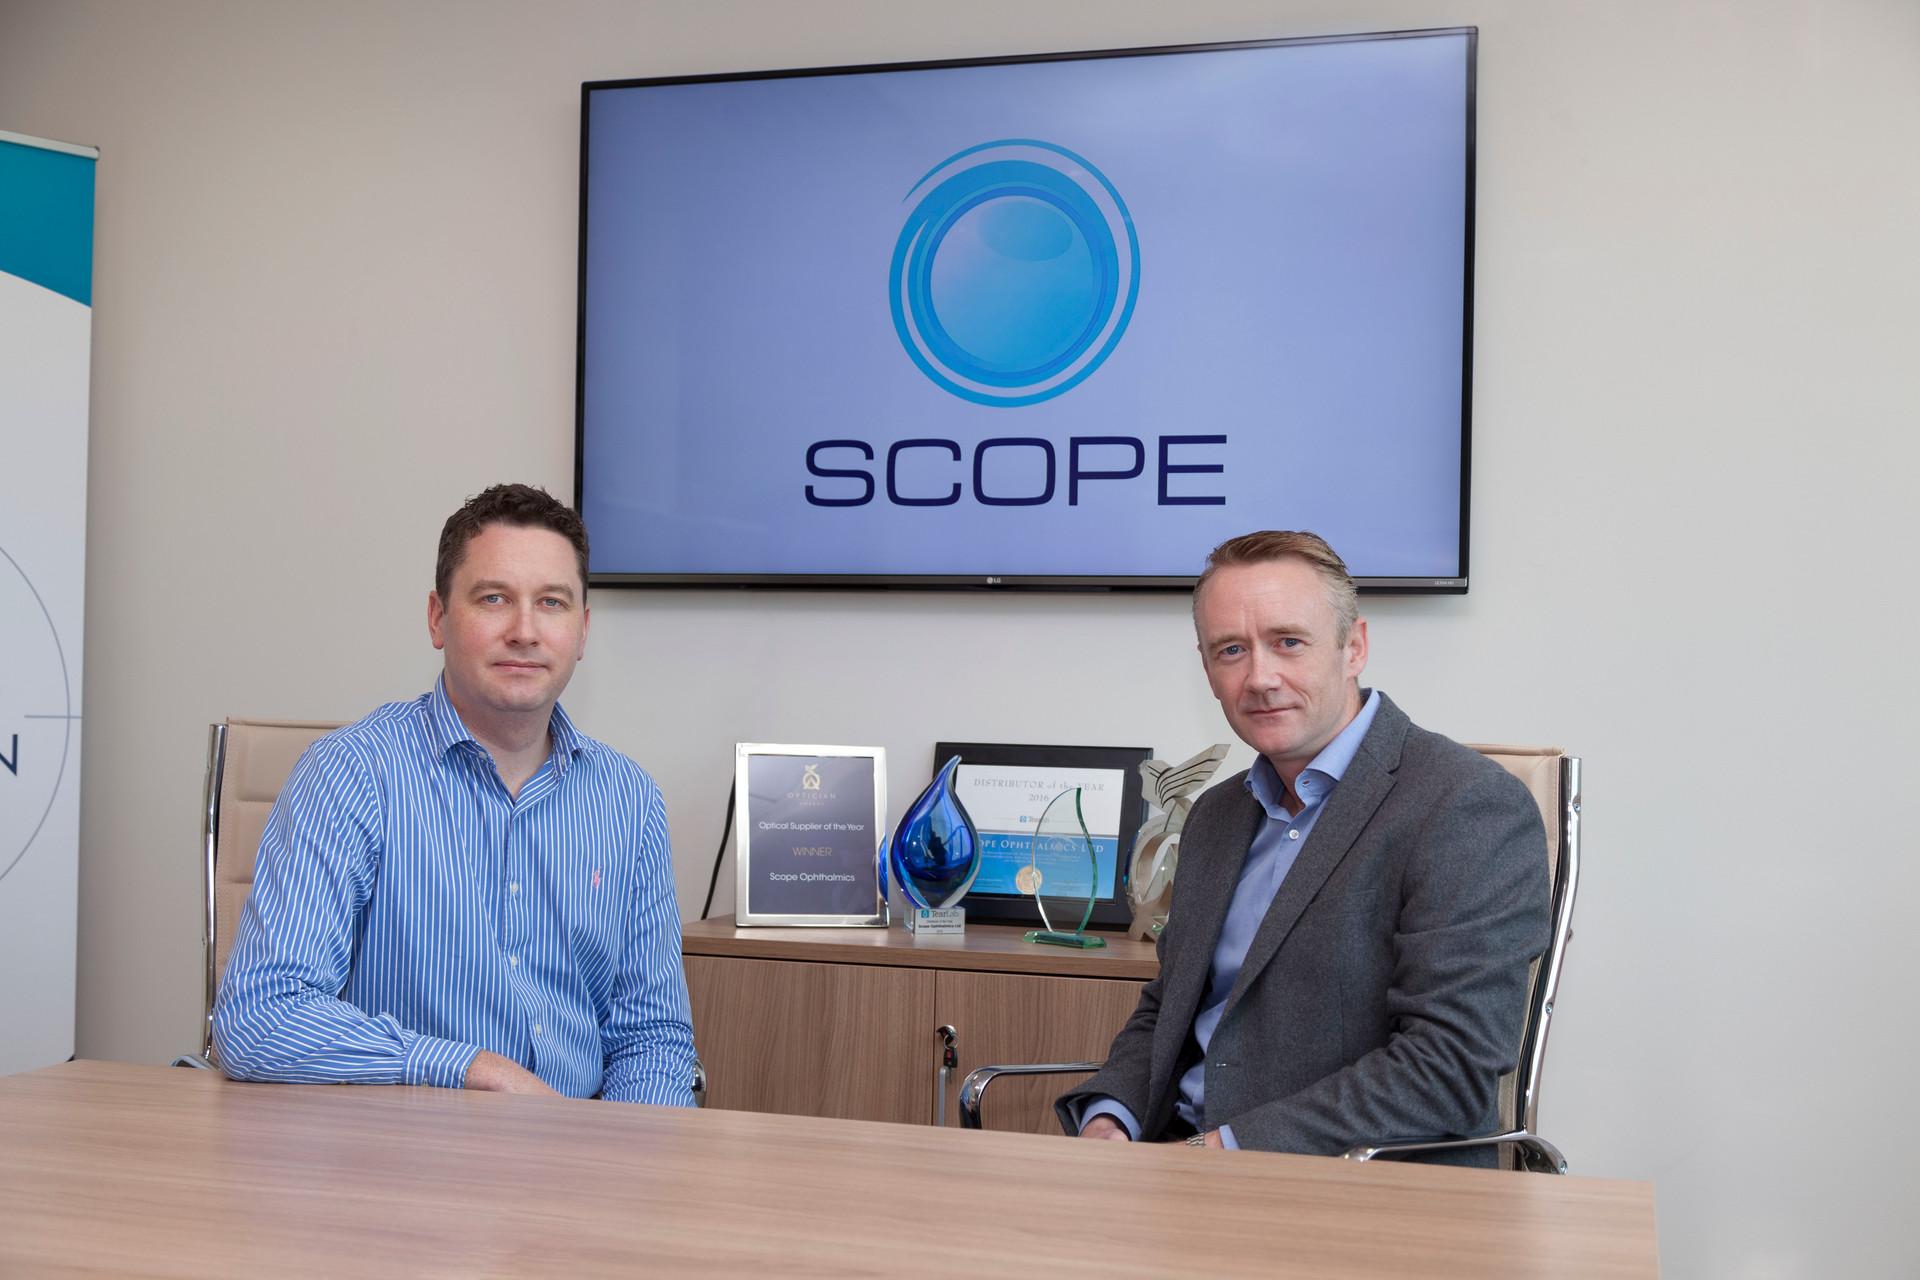 Scope_Website_002.jpg